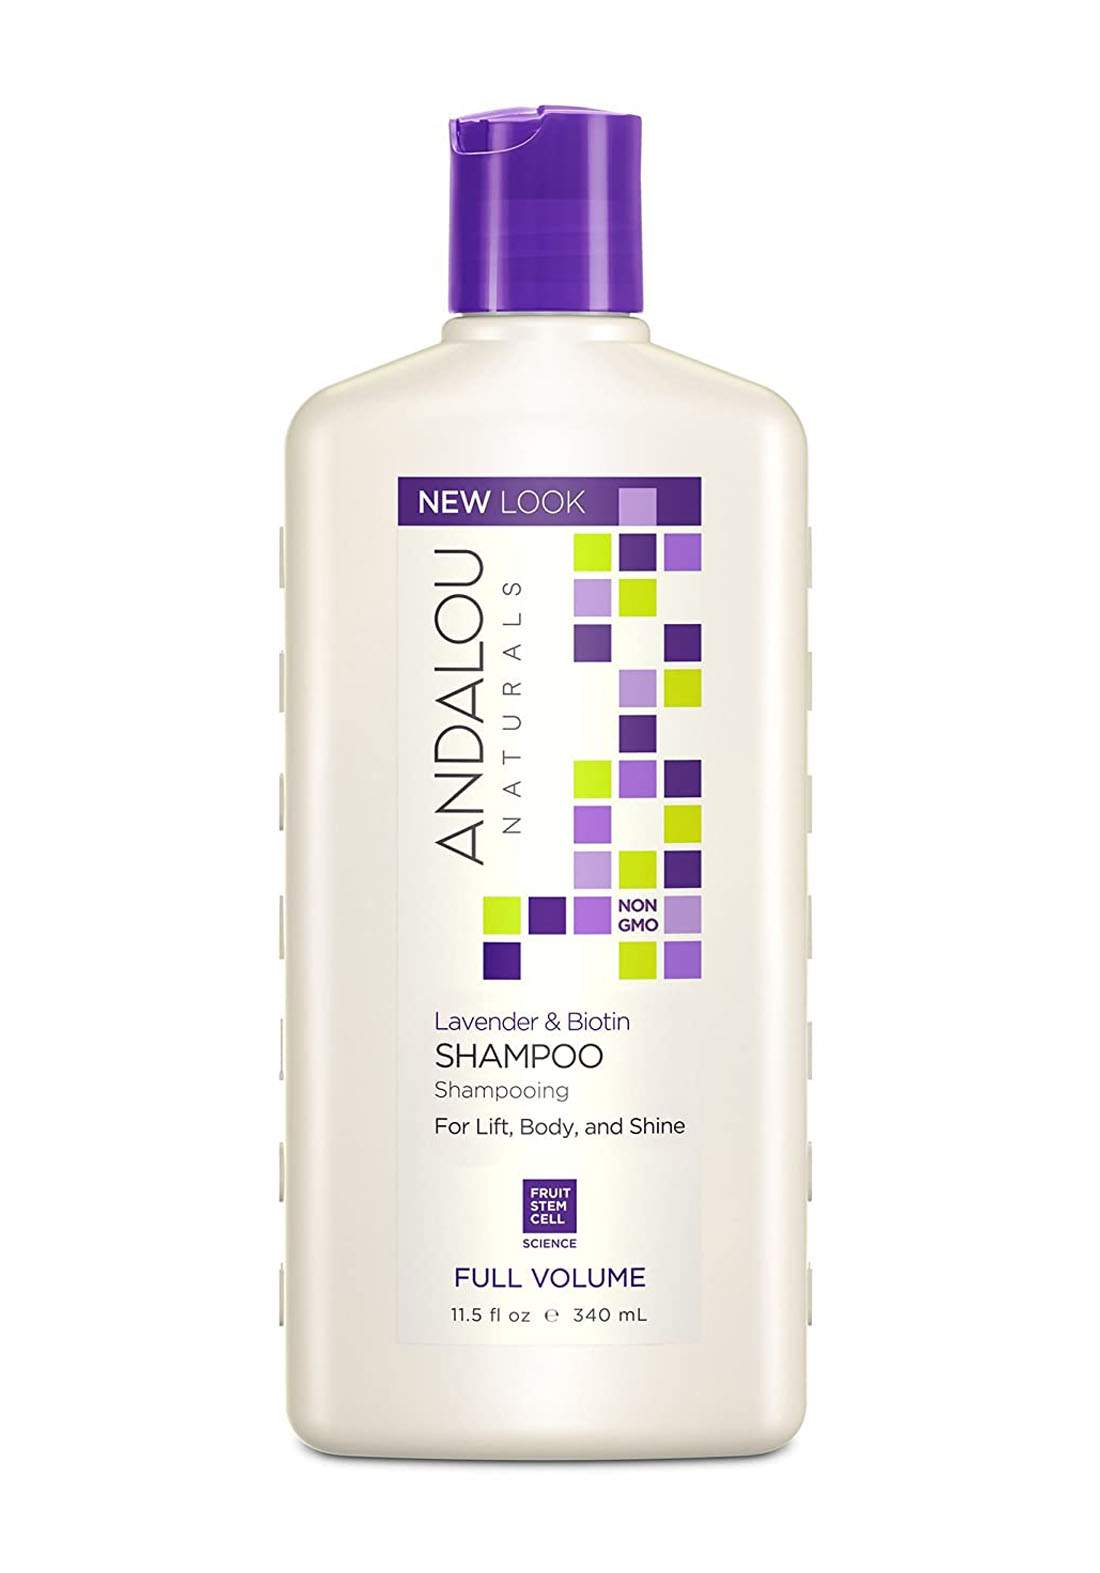 27100 Andalou Naturals Lavender Biotin Shampoo Full Volume 340ml شامبو للشعر